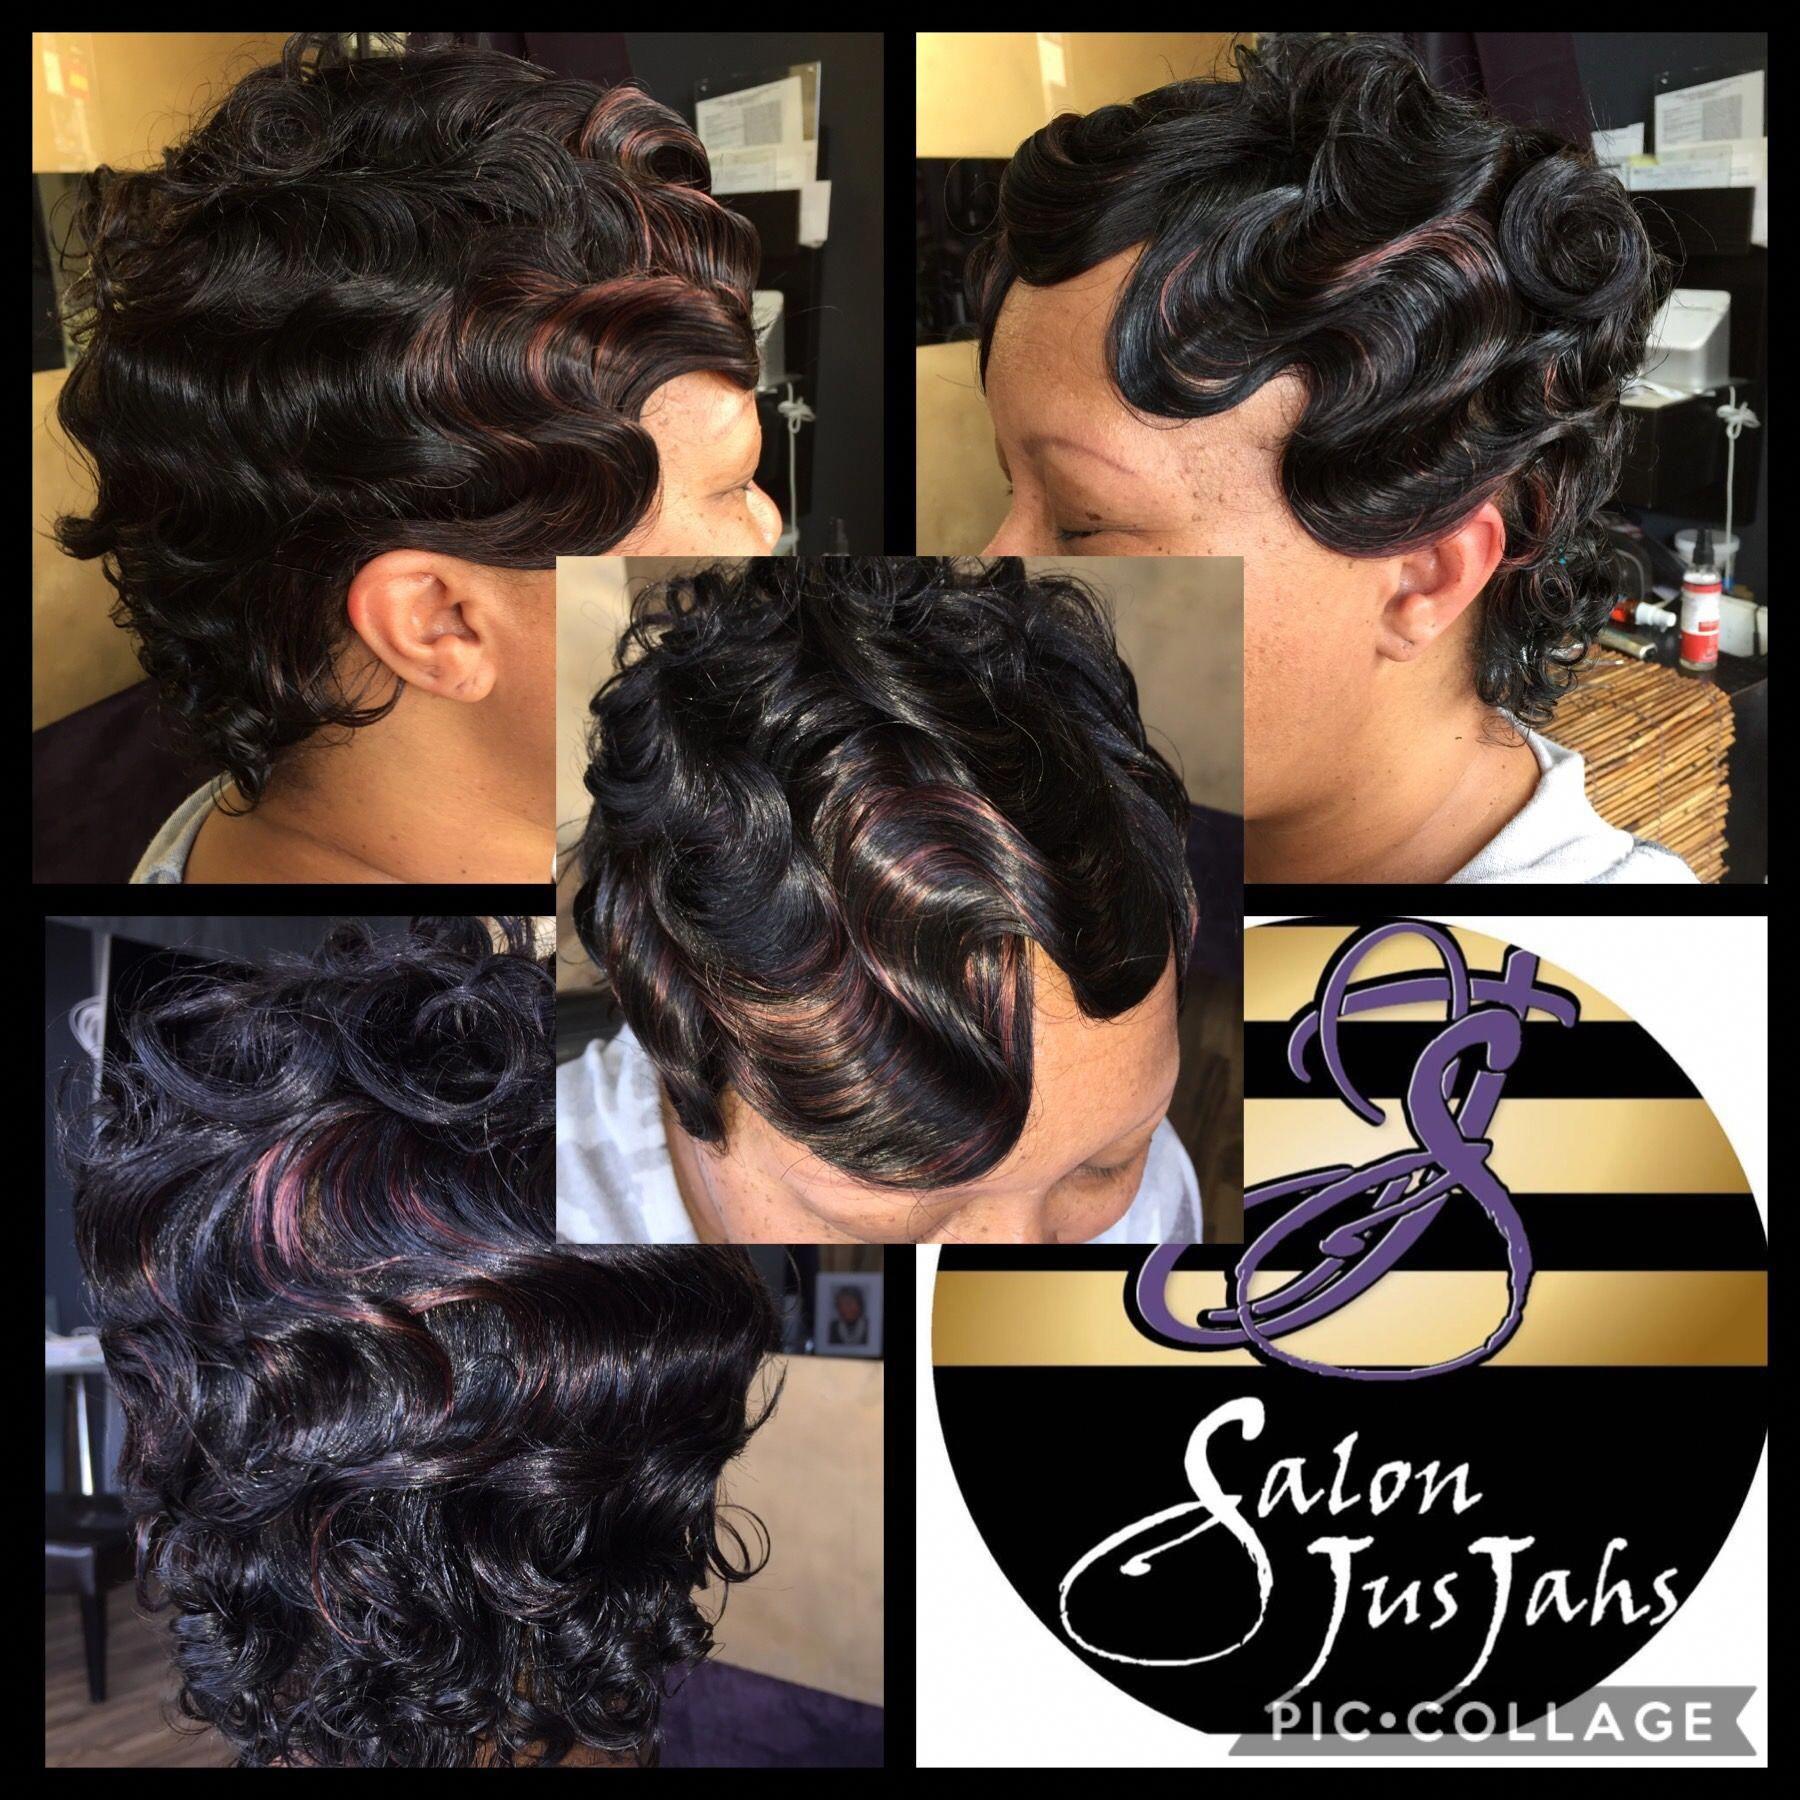 Curls fingerwaves salonjusjahs baltimoresalons